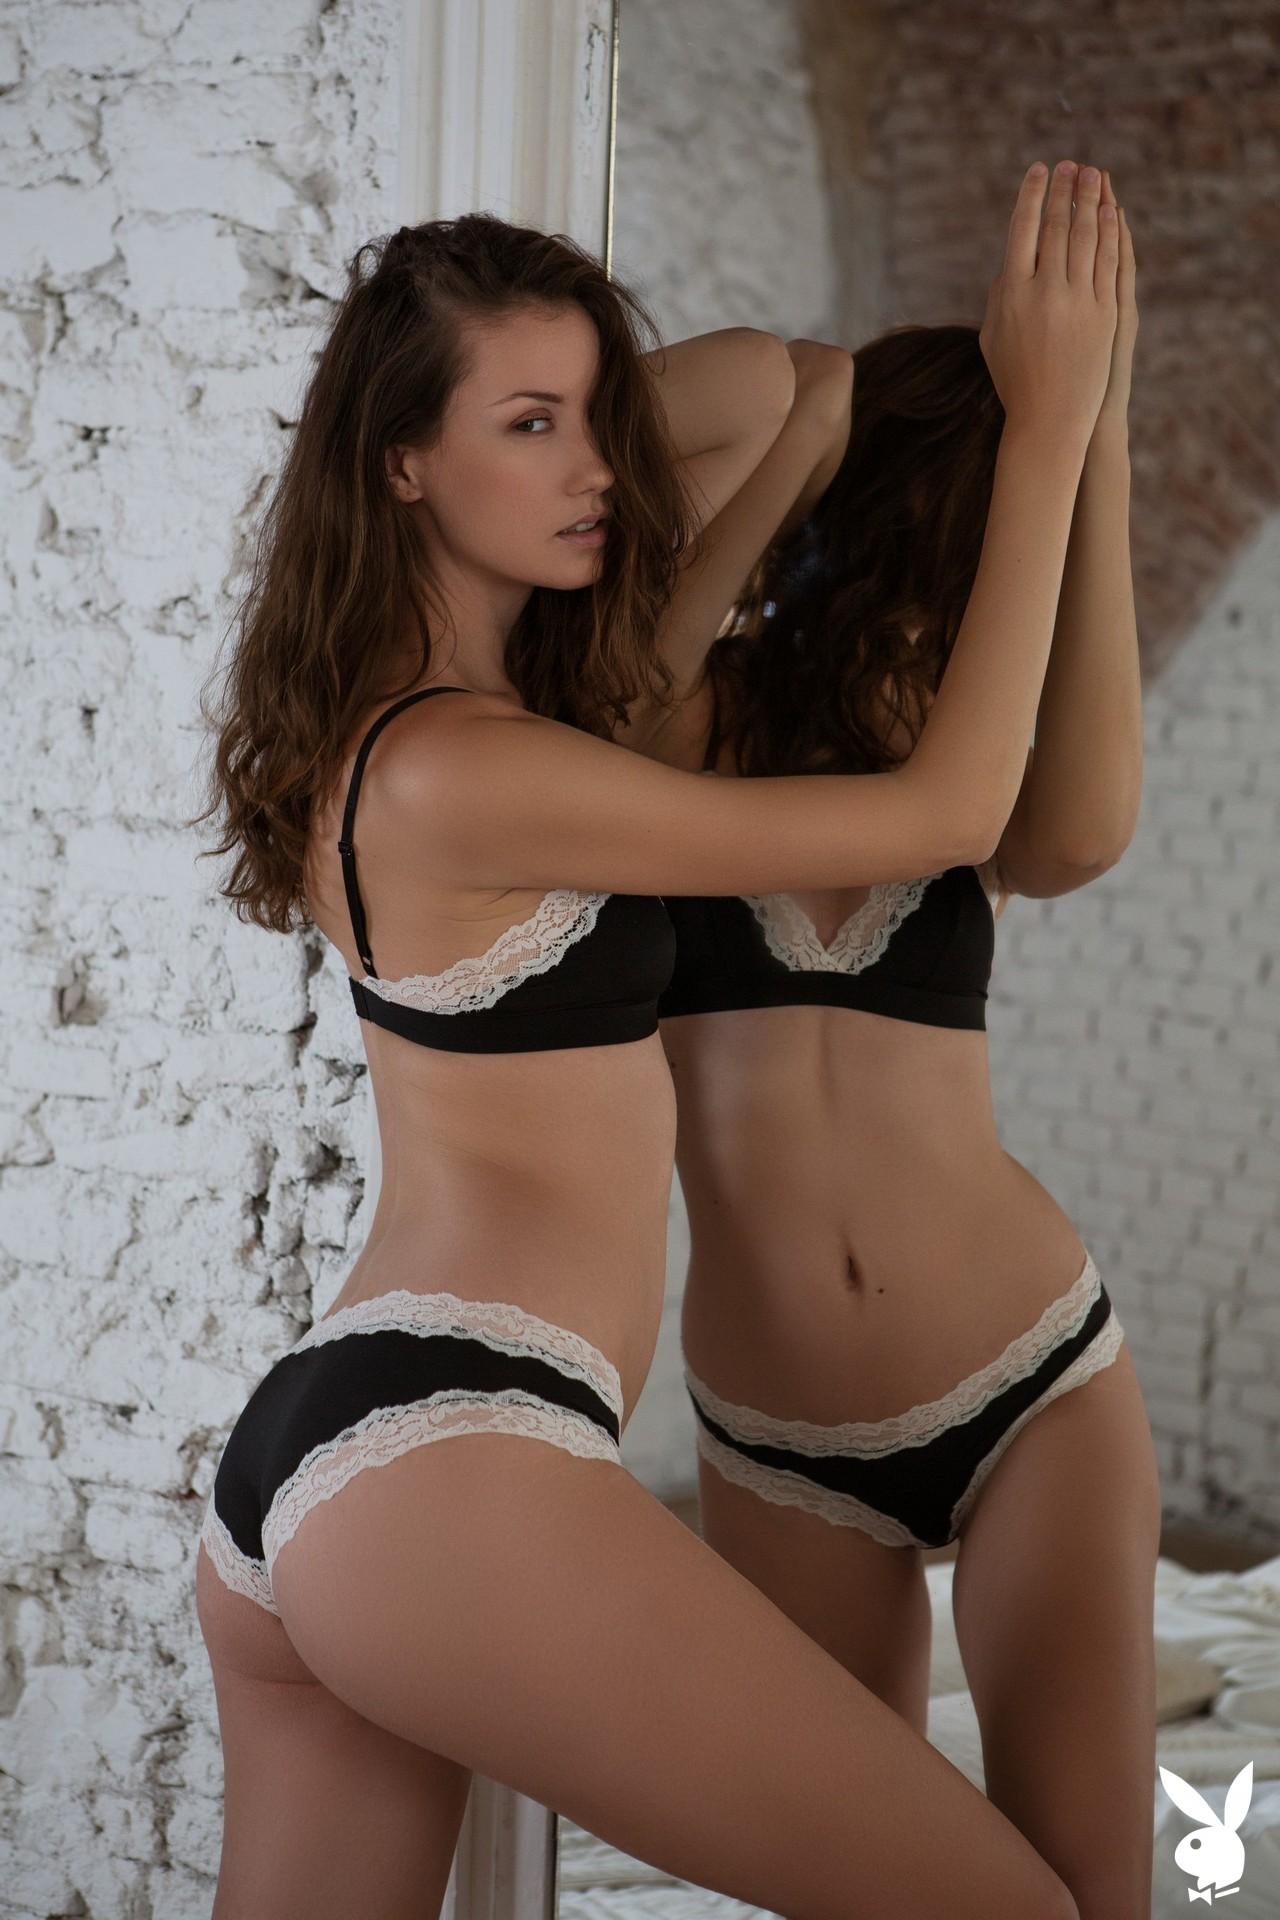 Mikaela Mckenna In Early Awakening Playboy Plus (5)